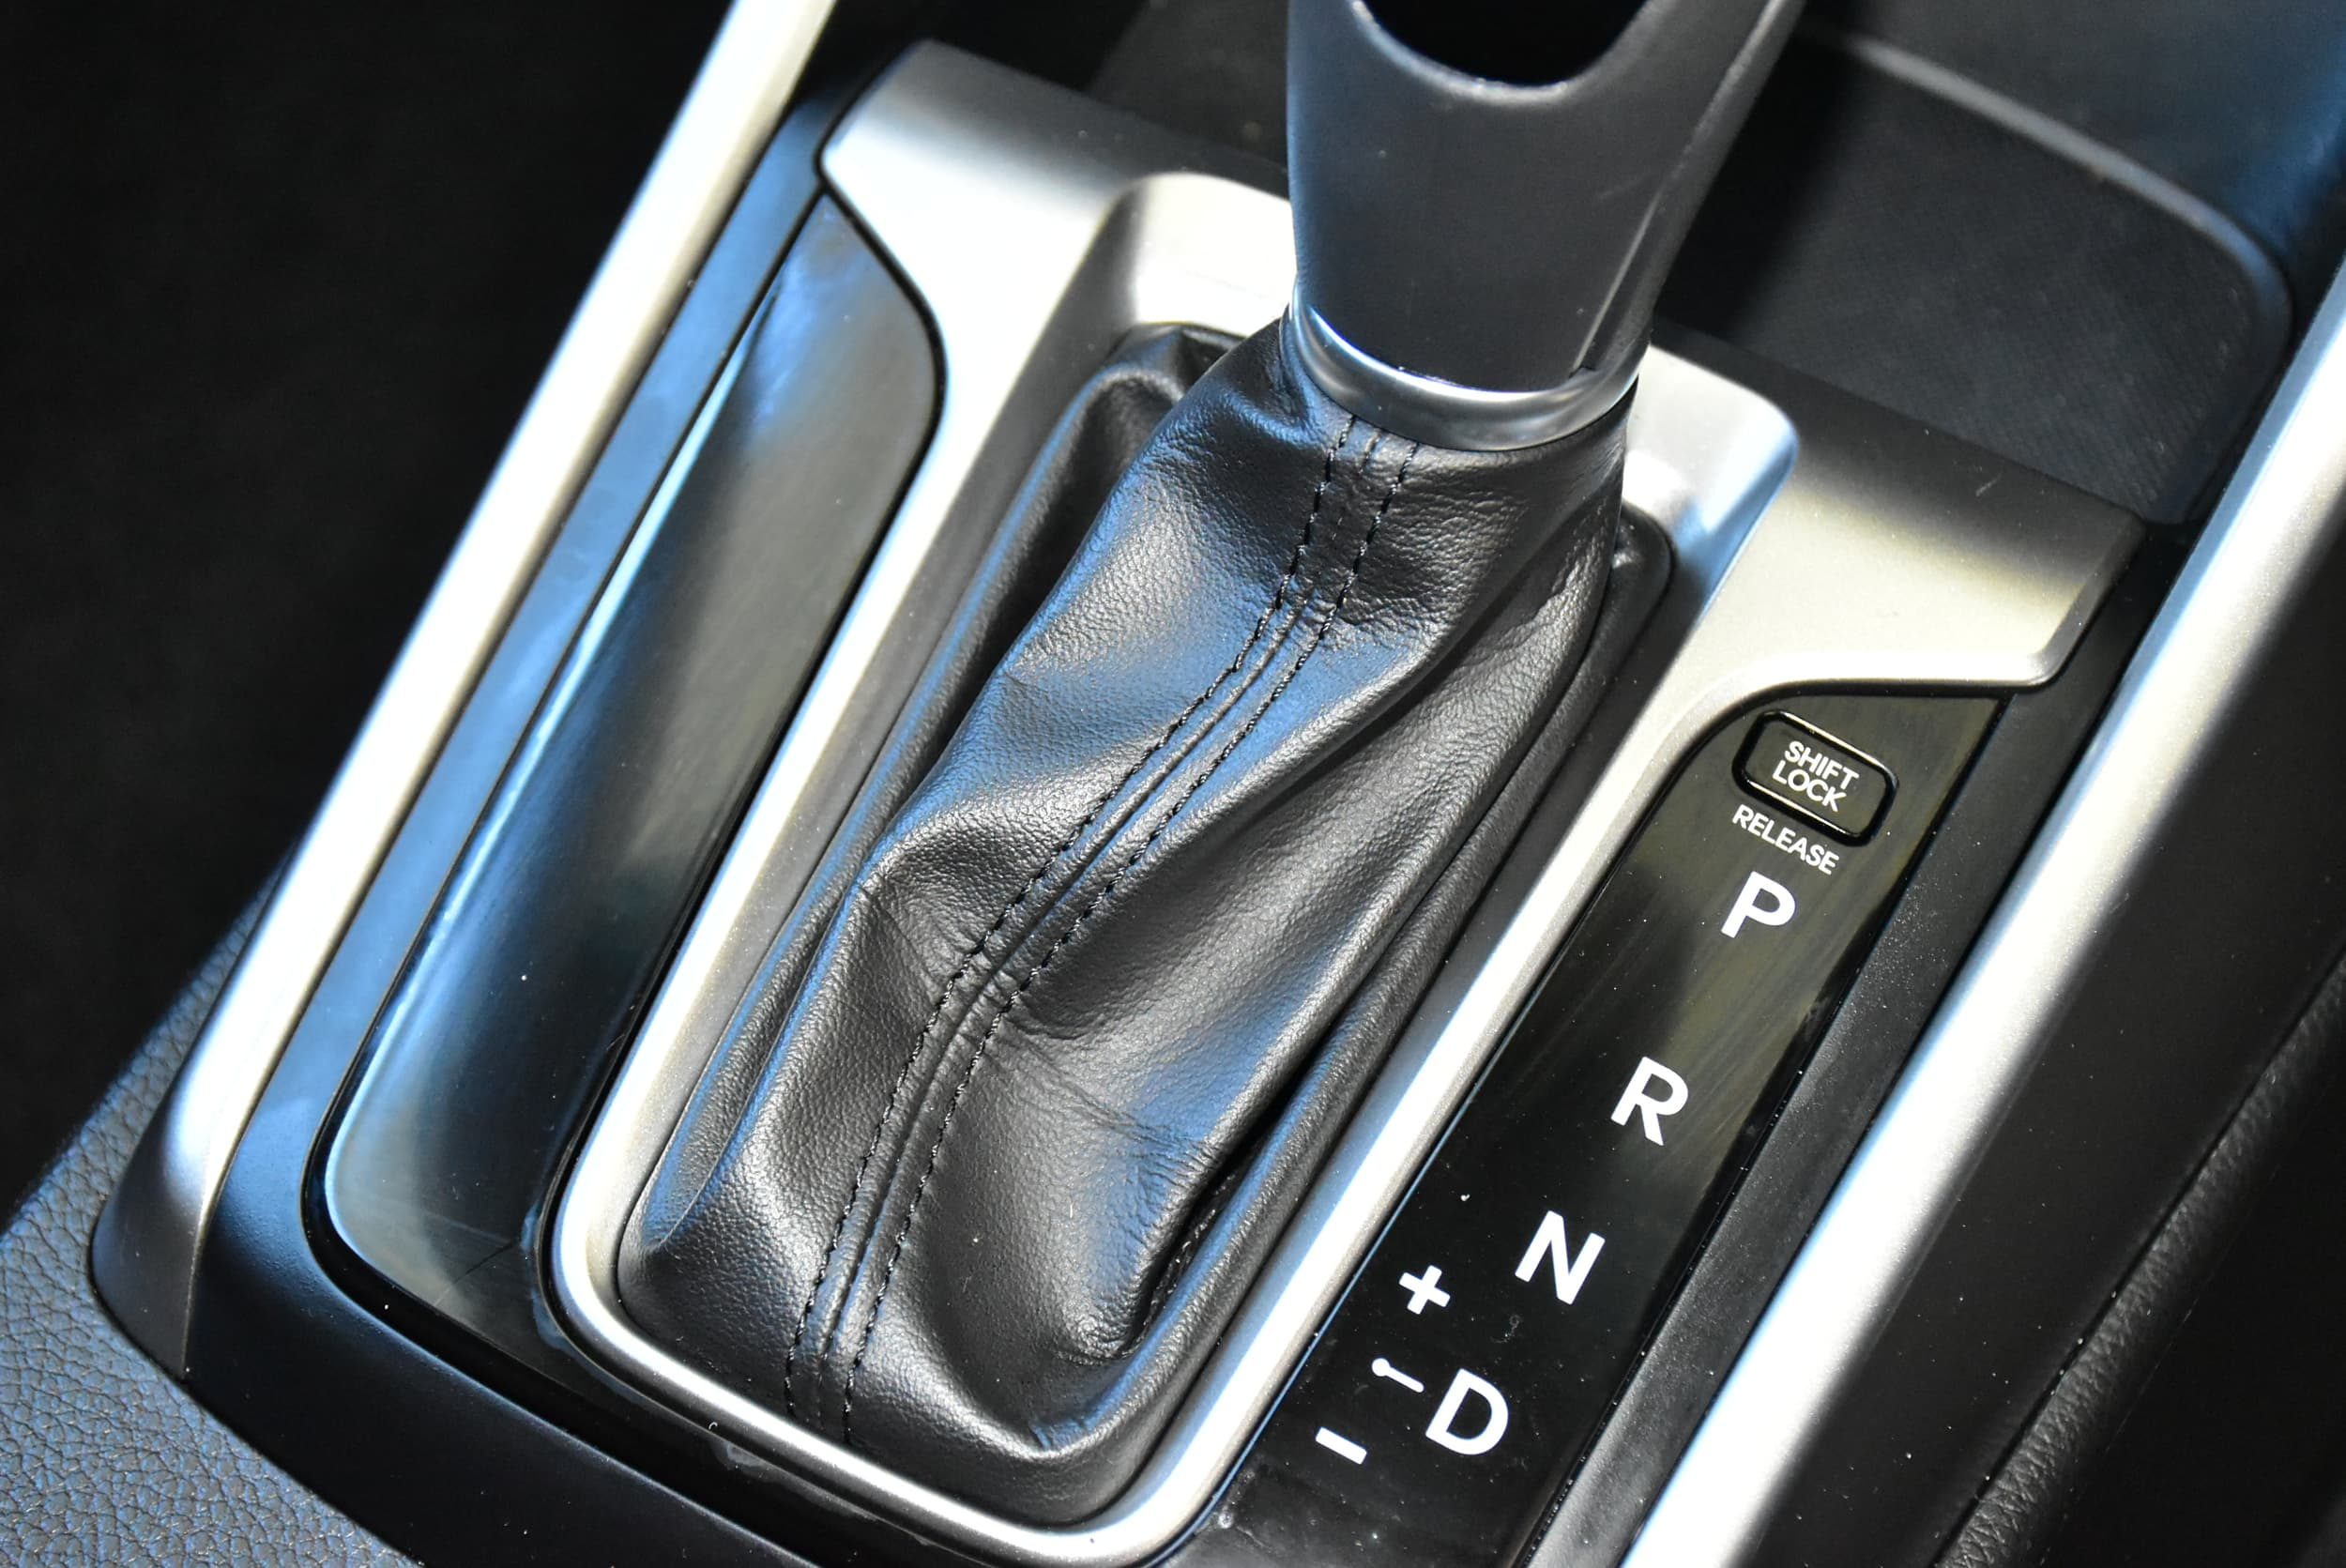 2014 Hyundai i30 Active Auto - image 11